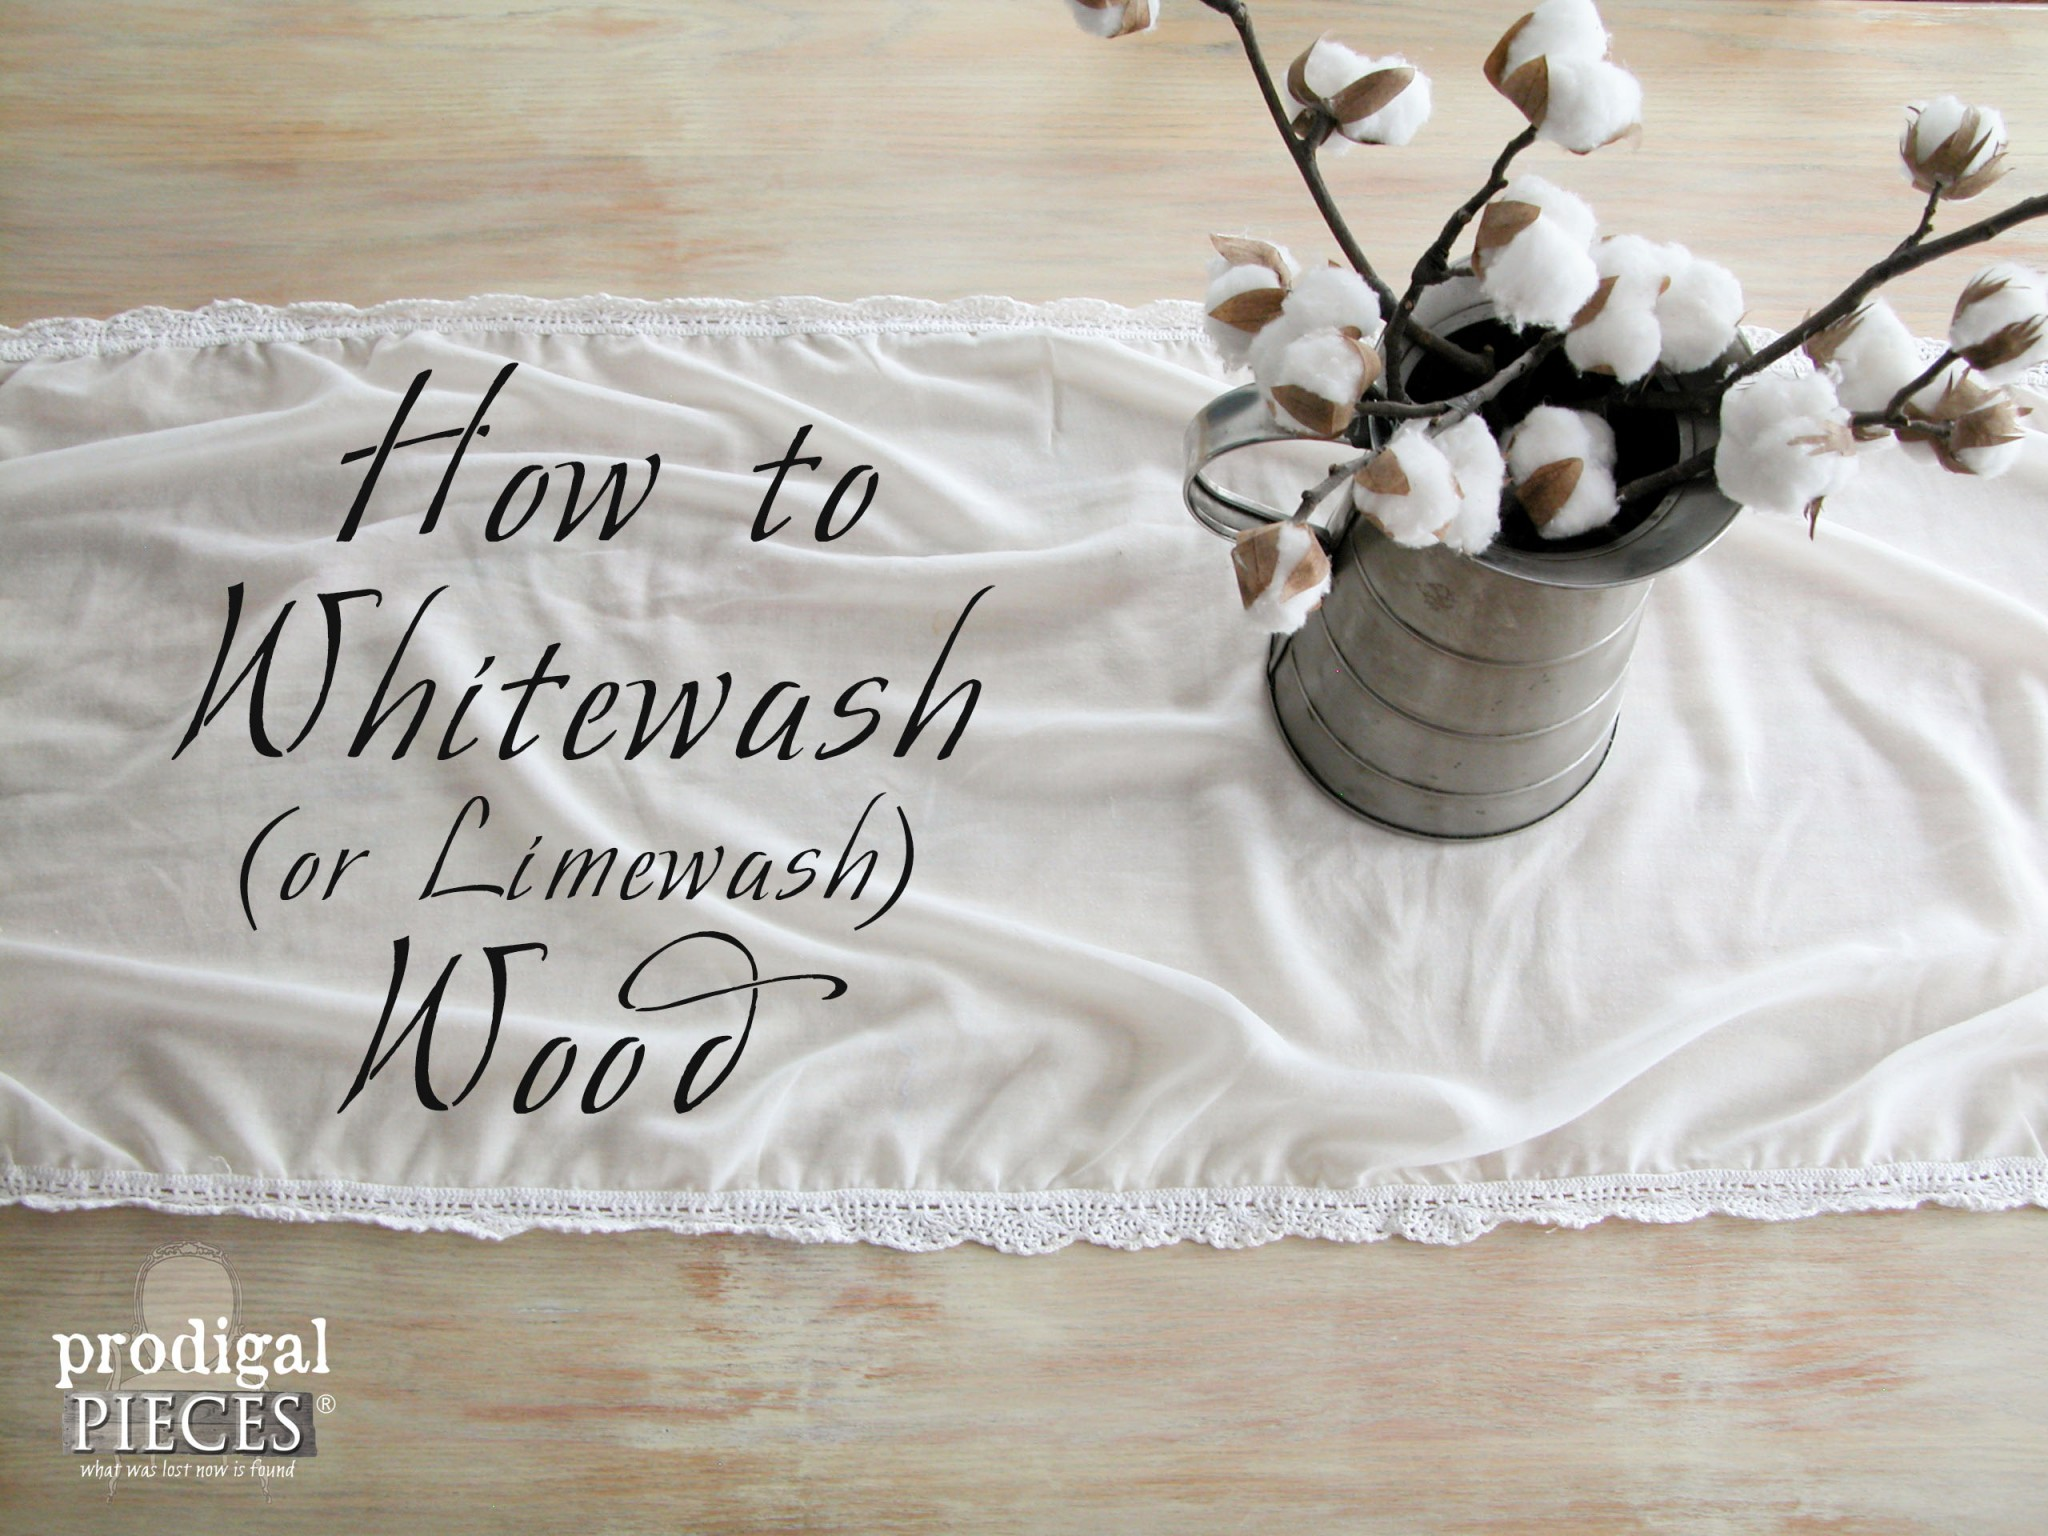 How to Whitewash (or Limewash) Wood by Prodigal Pieces | www.prodiglpieces.com